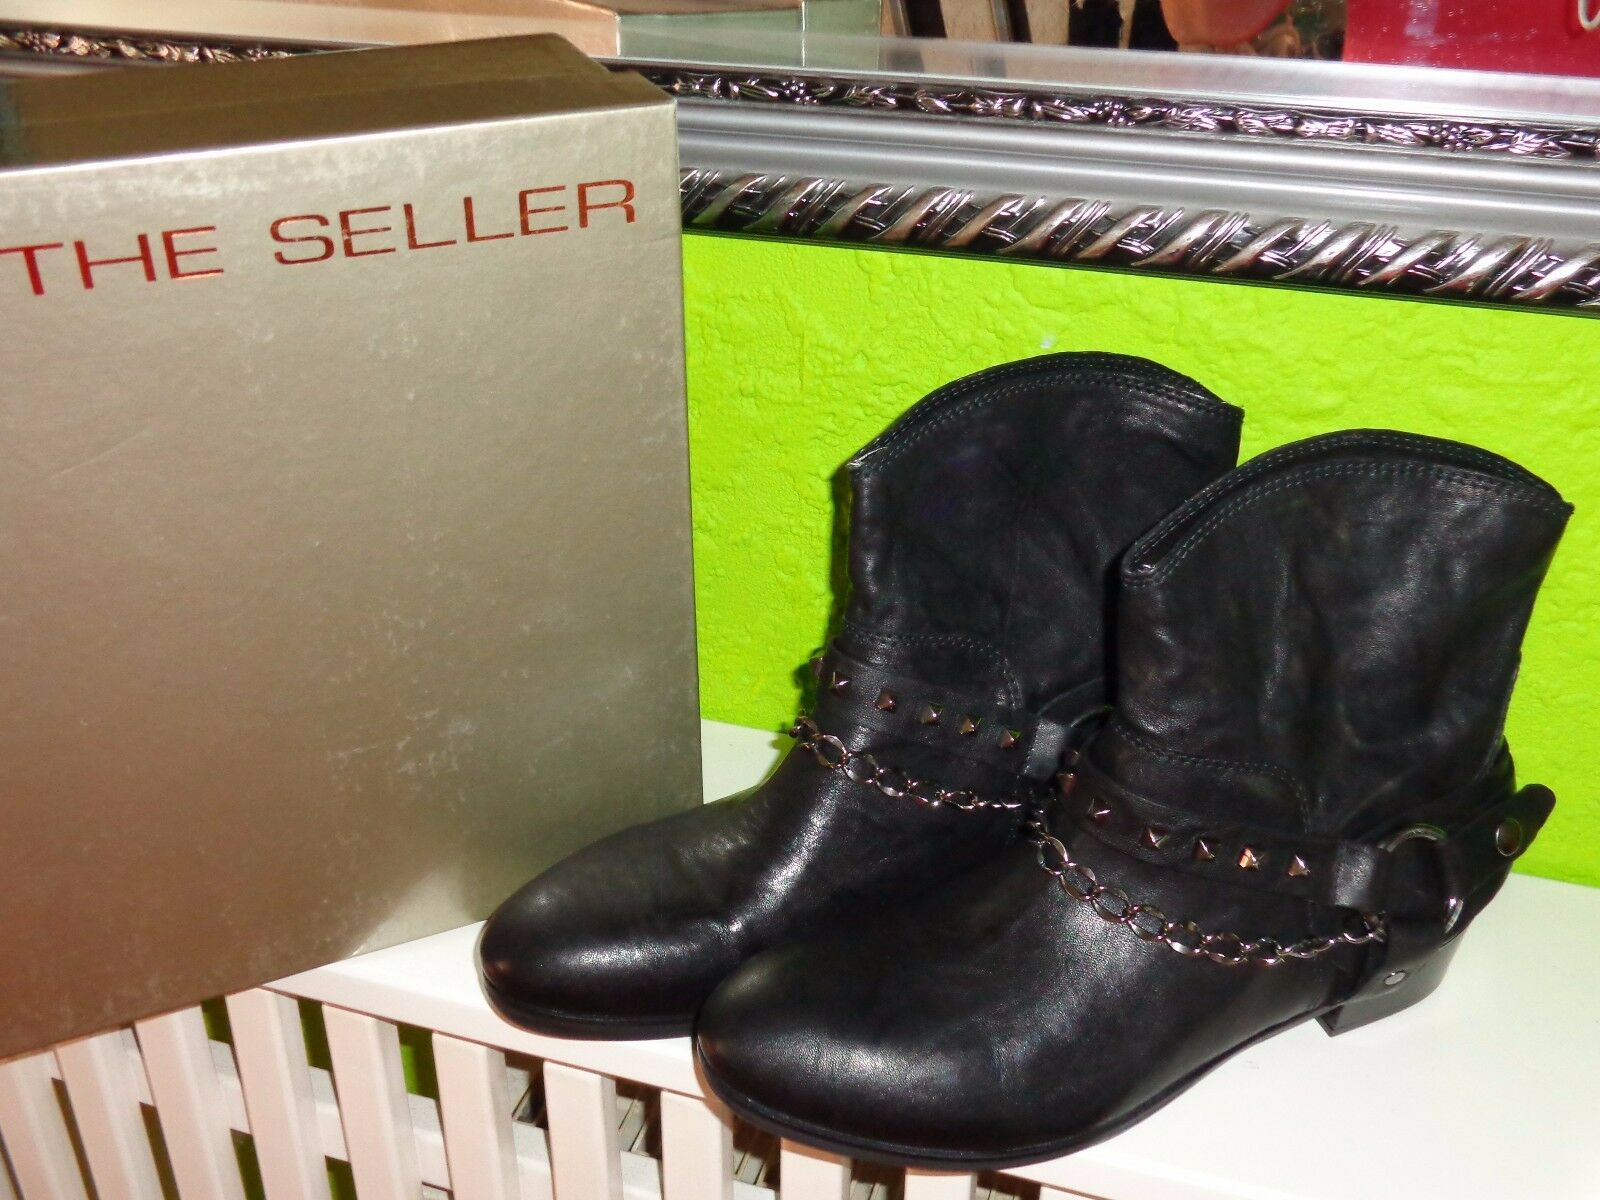 The Seller Stiefeletten Stiefel Leder Neu Schwarz  Gr. 39,5 Neu Leder 366e3e